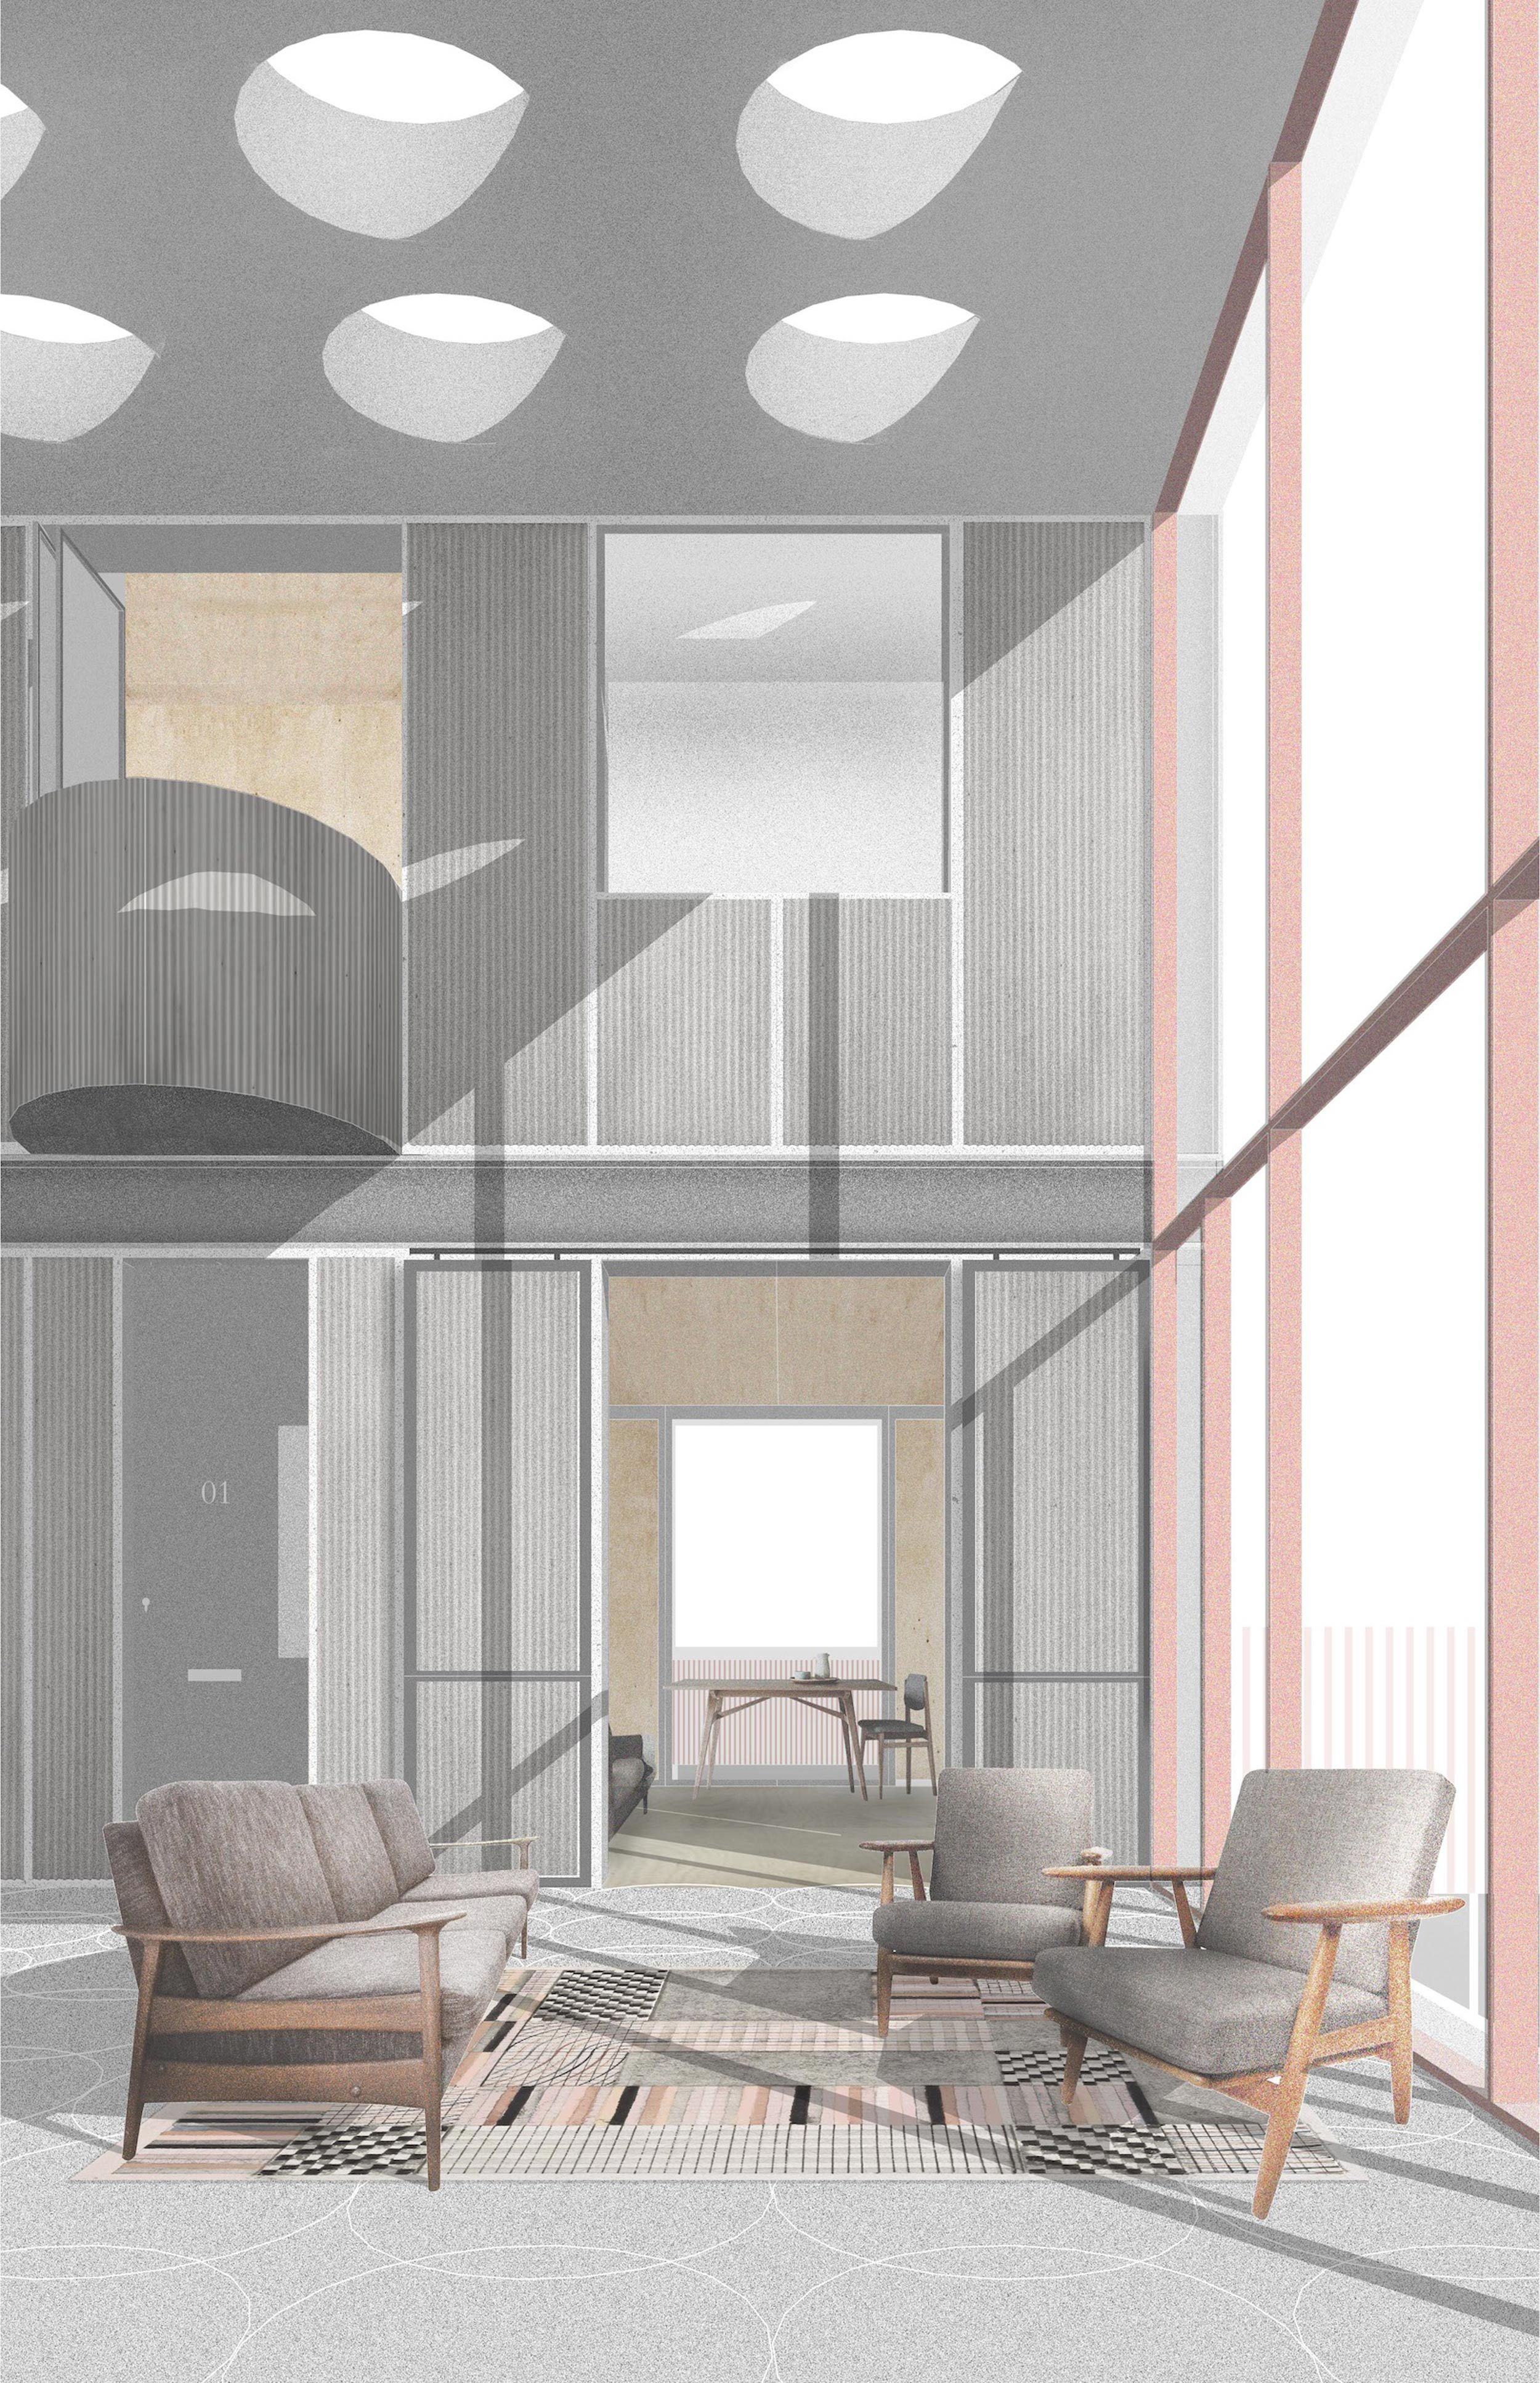 Vppr artist housing arch collage render co for Idee architettura interni